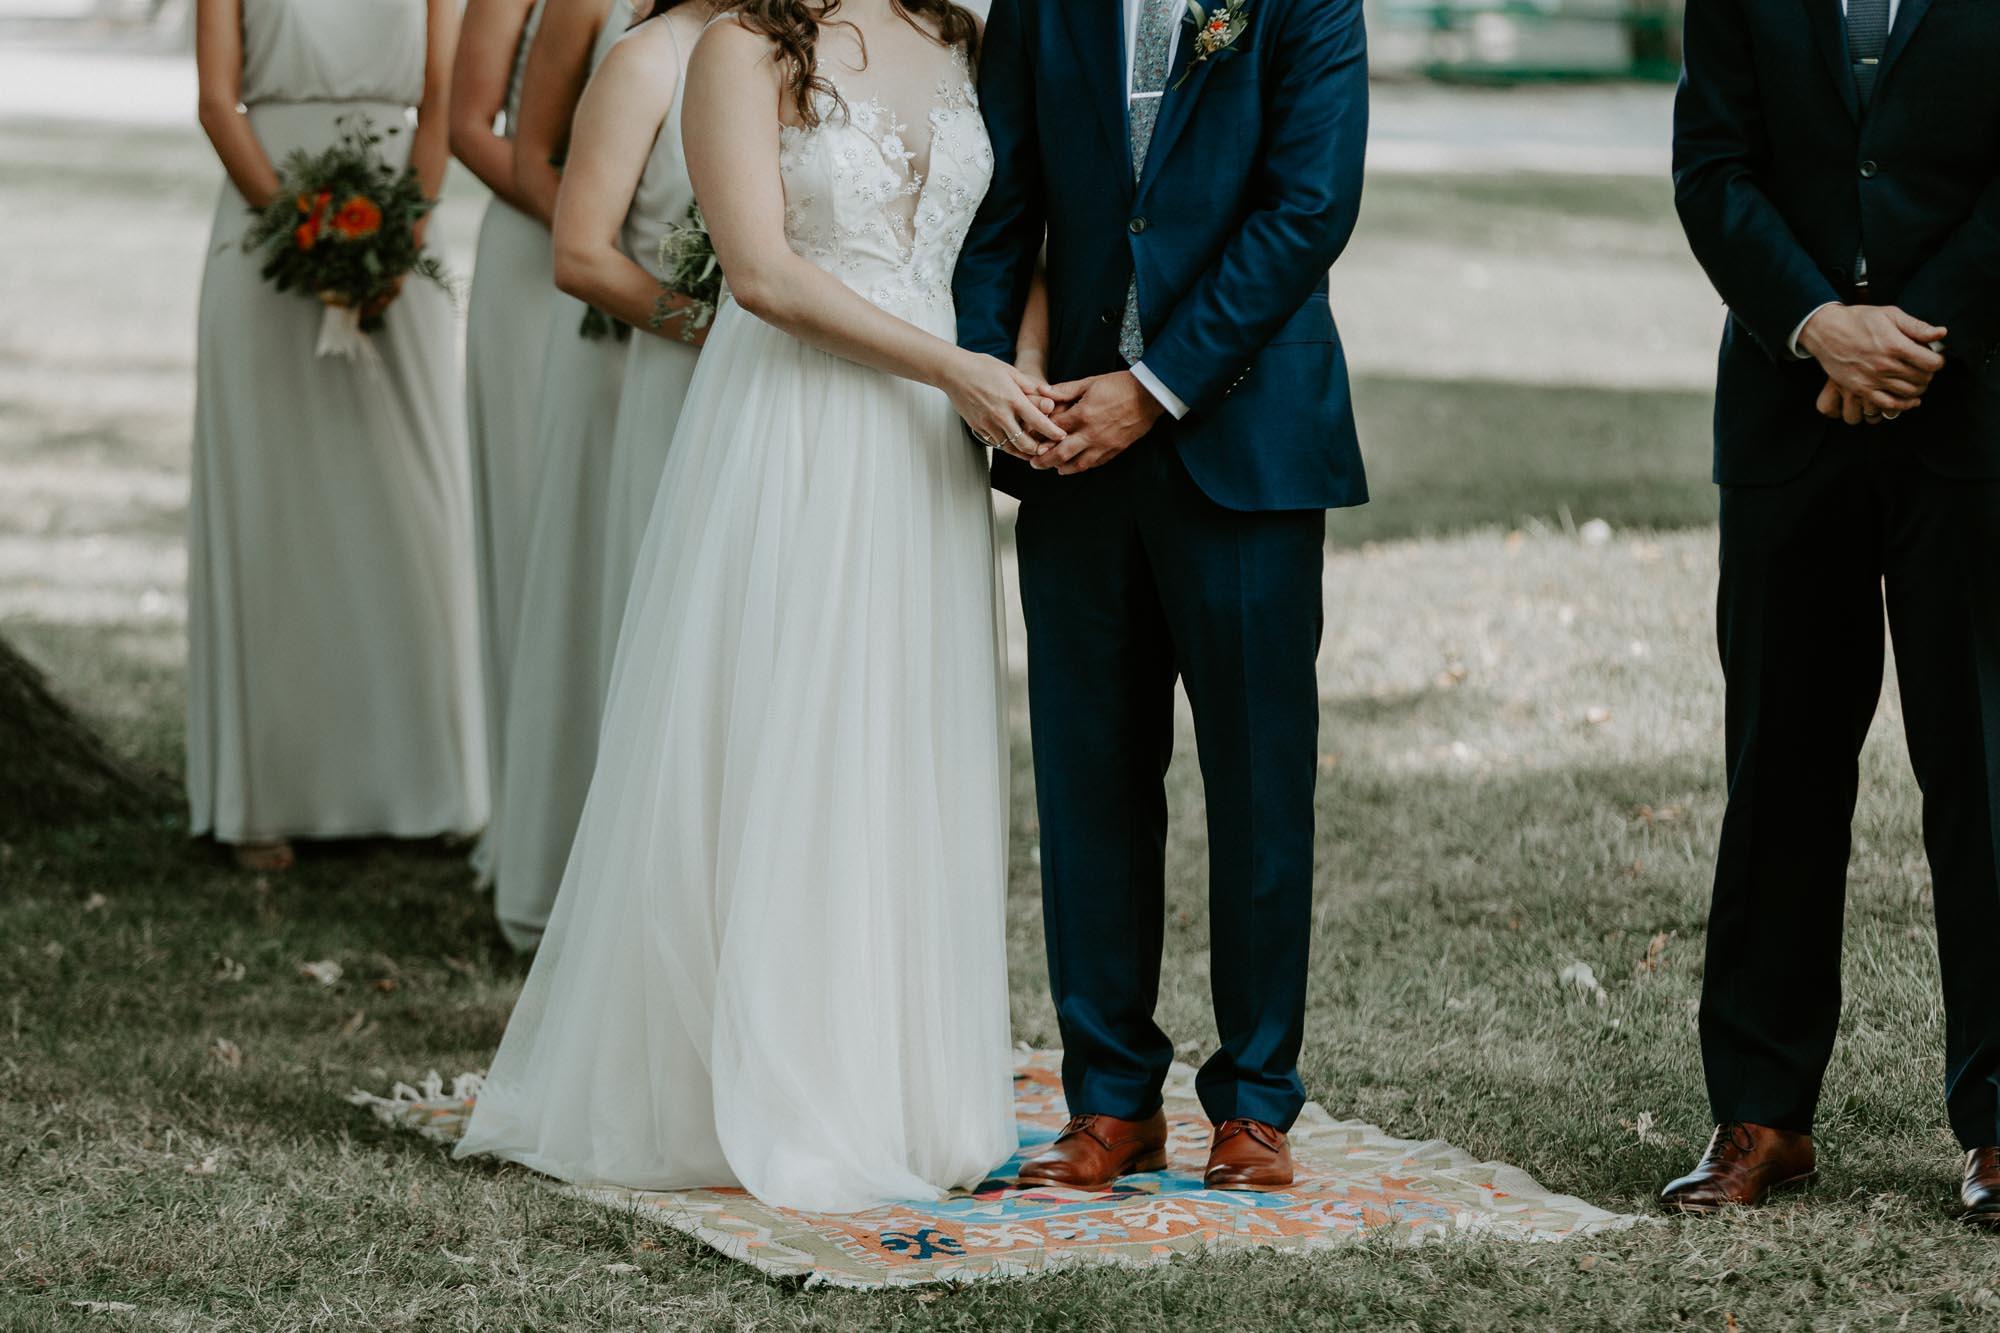 journeyman_distillery_wedding_photographer_chicago_il_wright_photographs-1.jpg